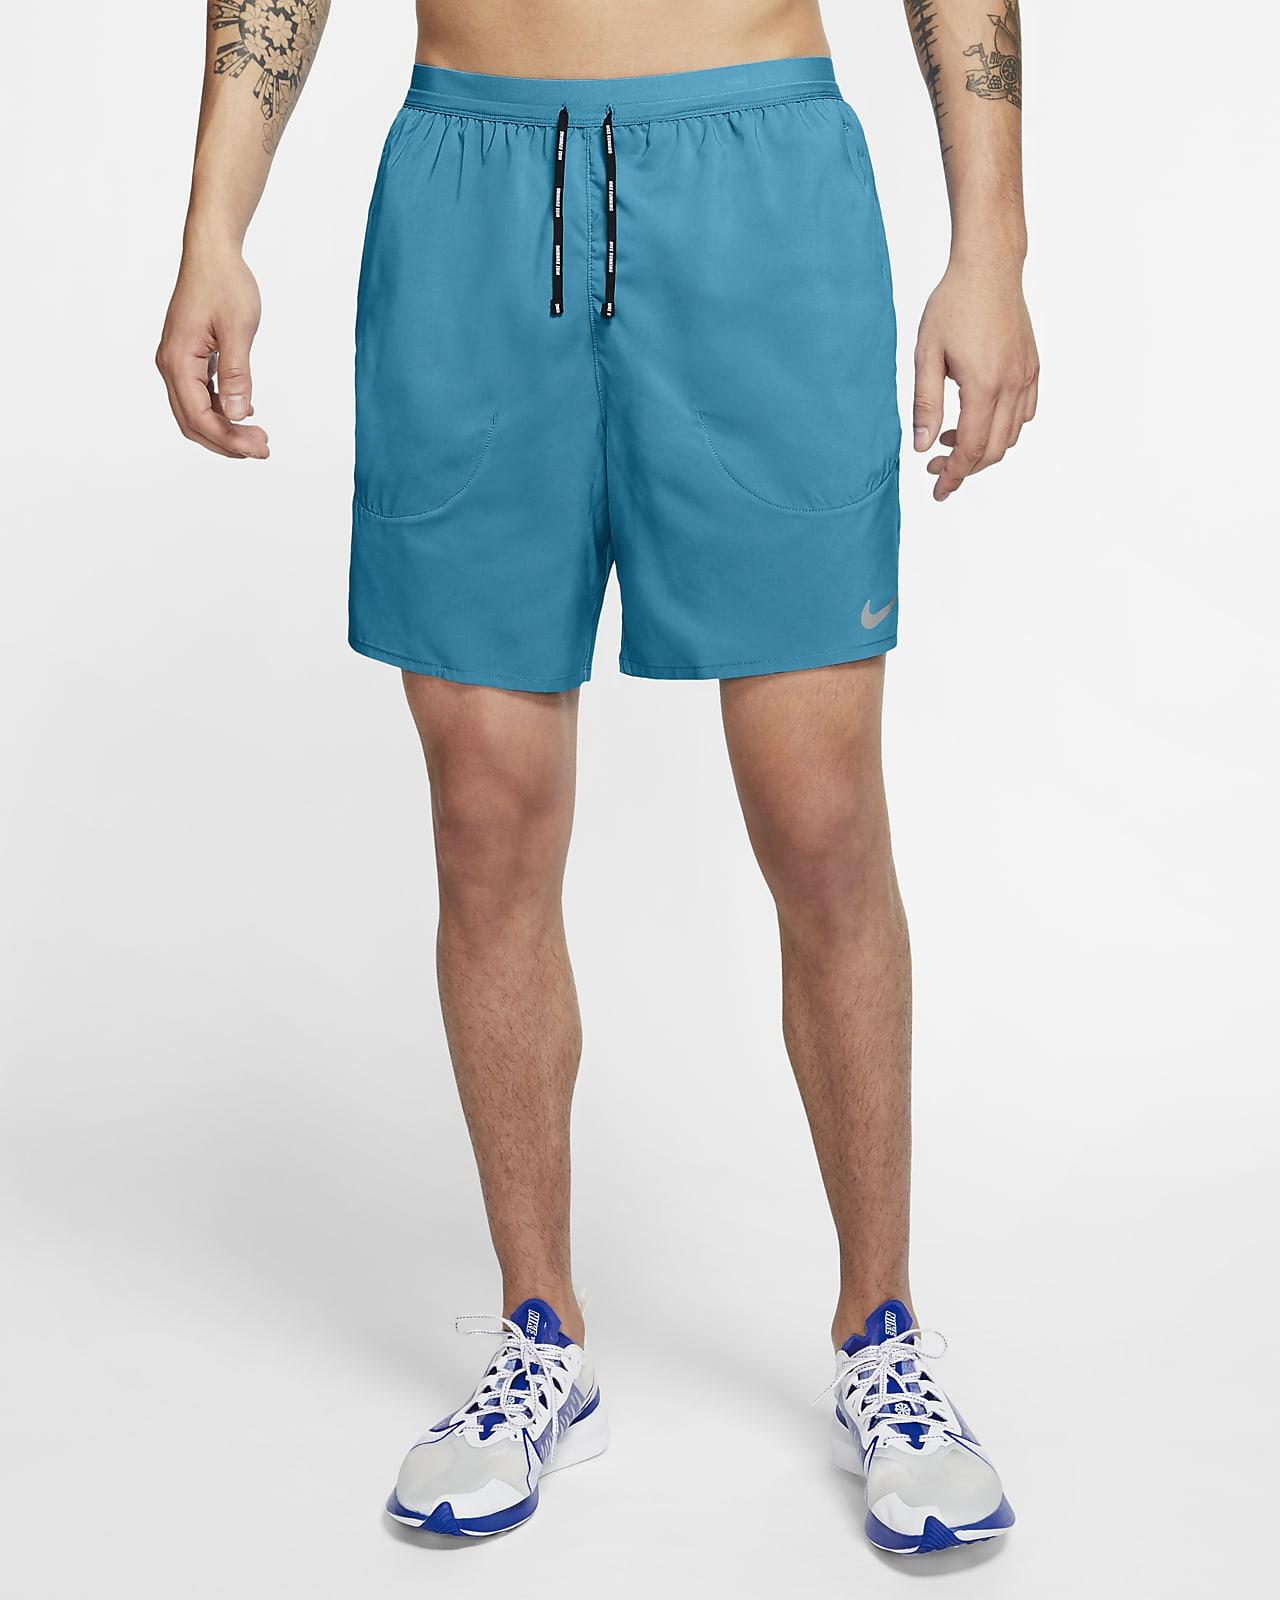 Nike Flex Stride Slip Erkek Koşu Şortu